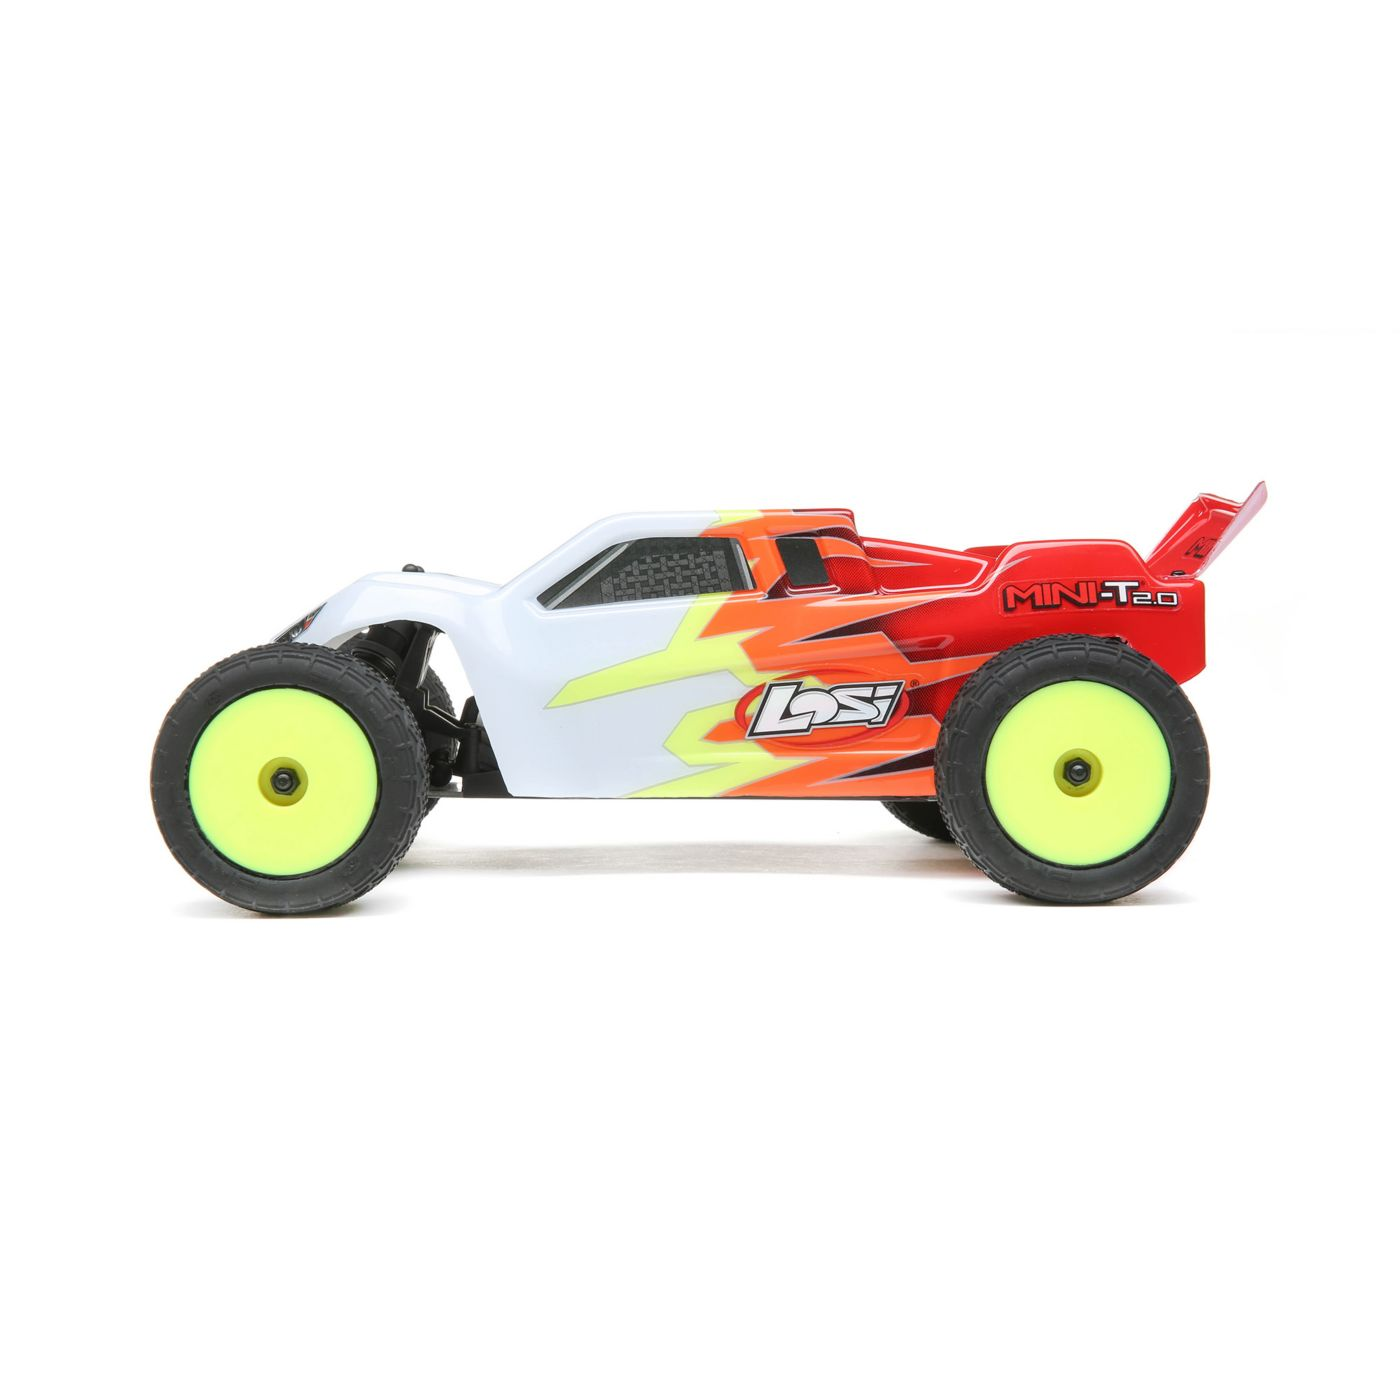 Losi Mini-T 2.0 - Side